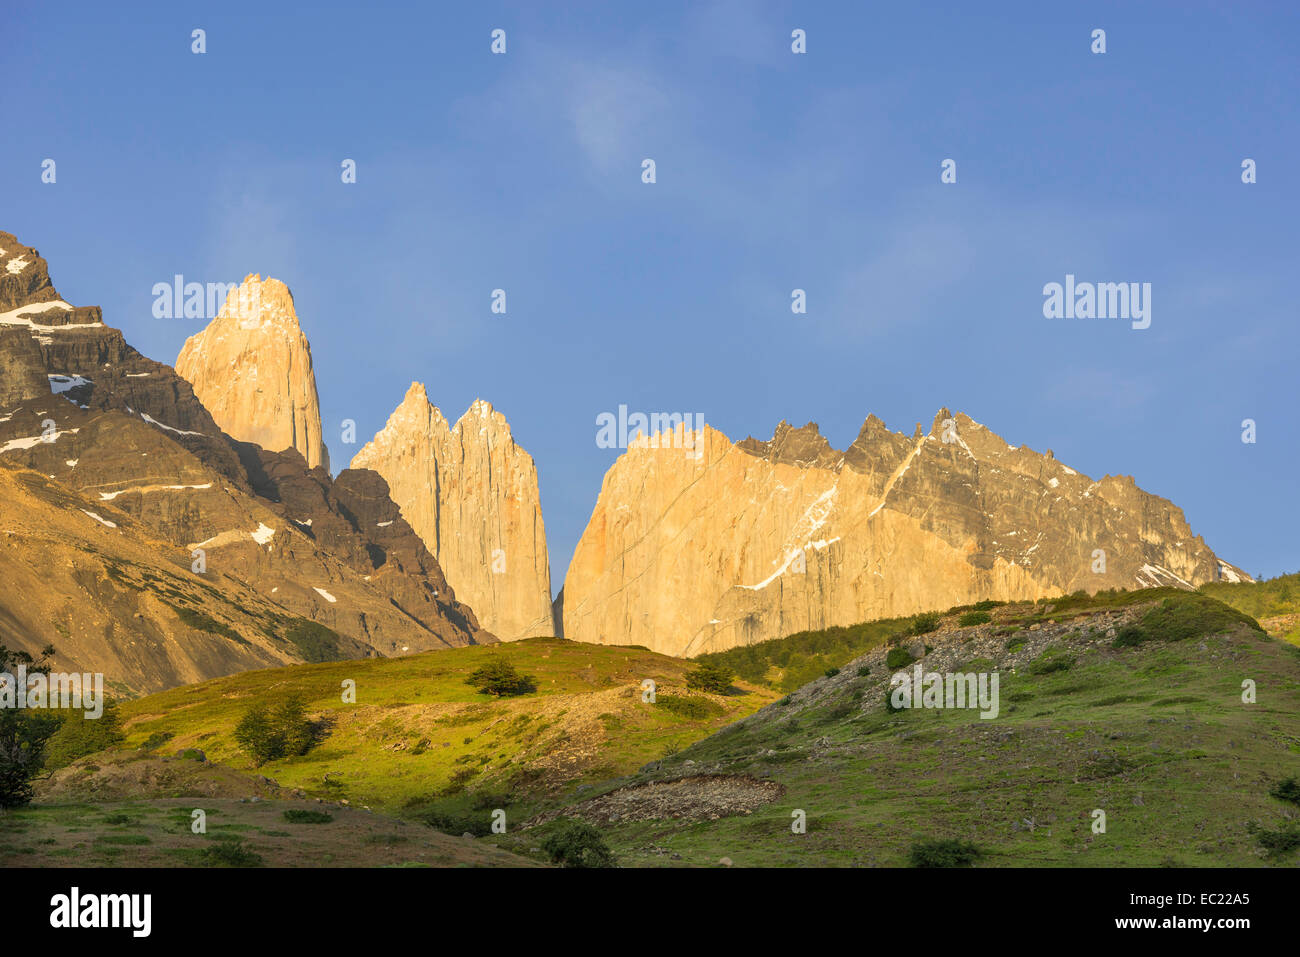 Torres del Paine in the morning, Torres del Paine National Park, Magallanes y la Antártica Chilena Region, - Stock Image